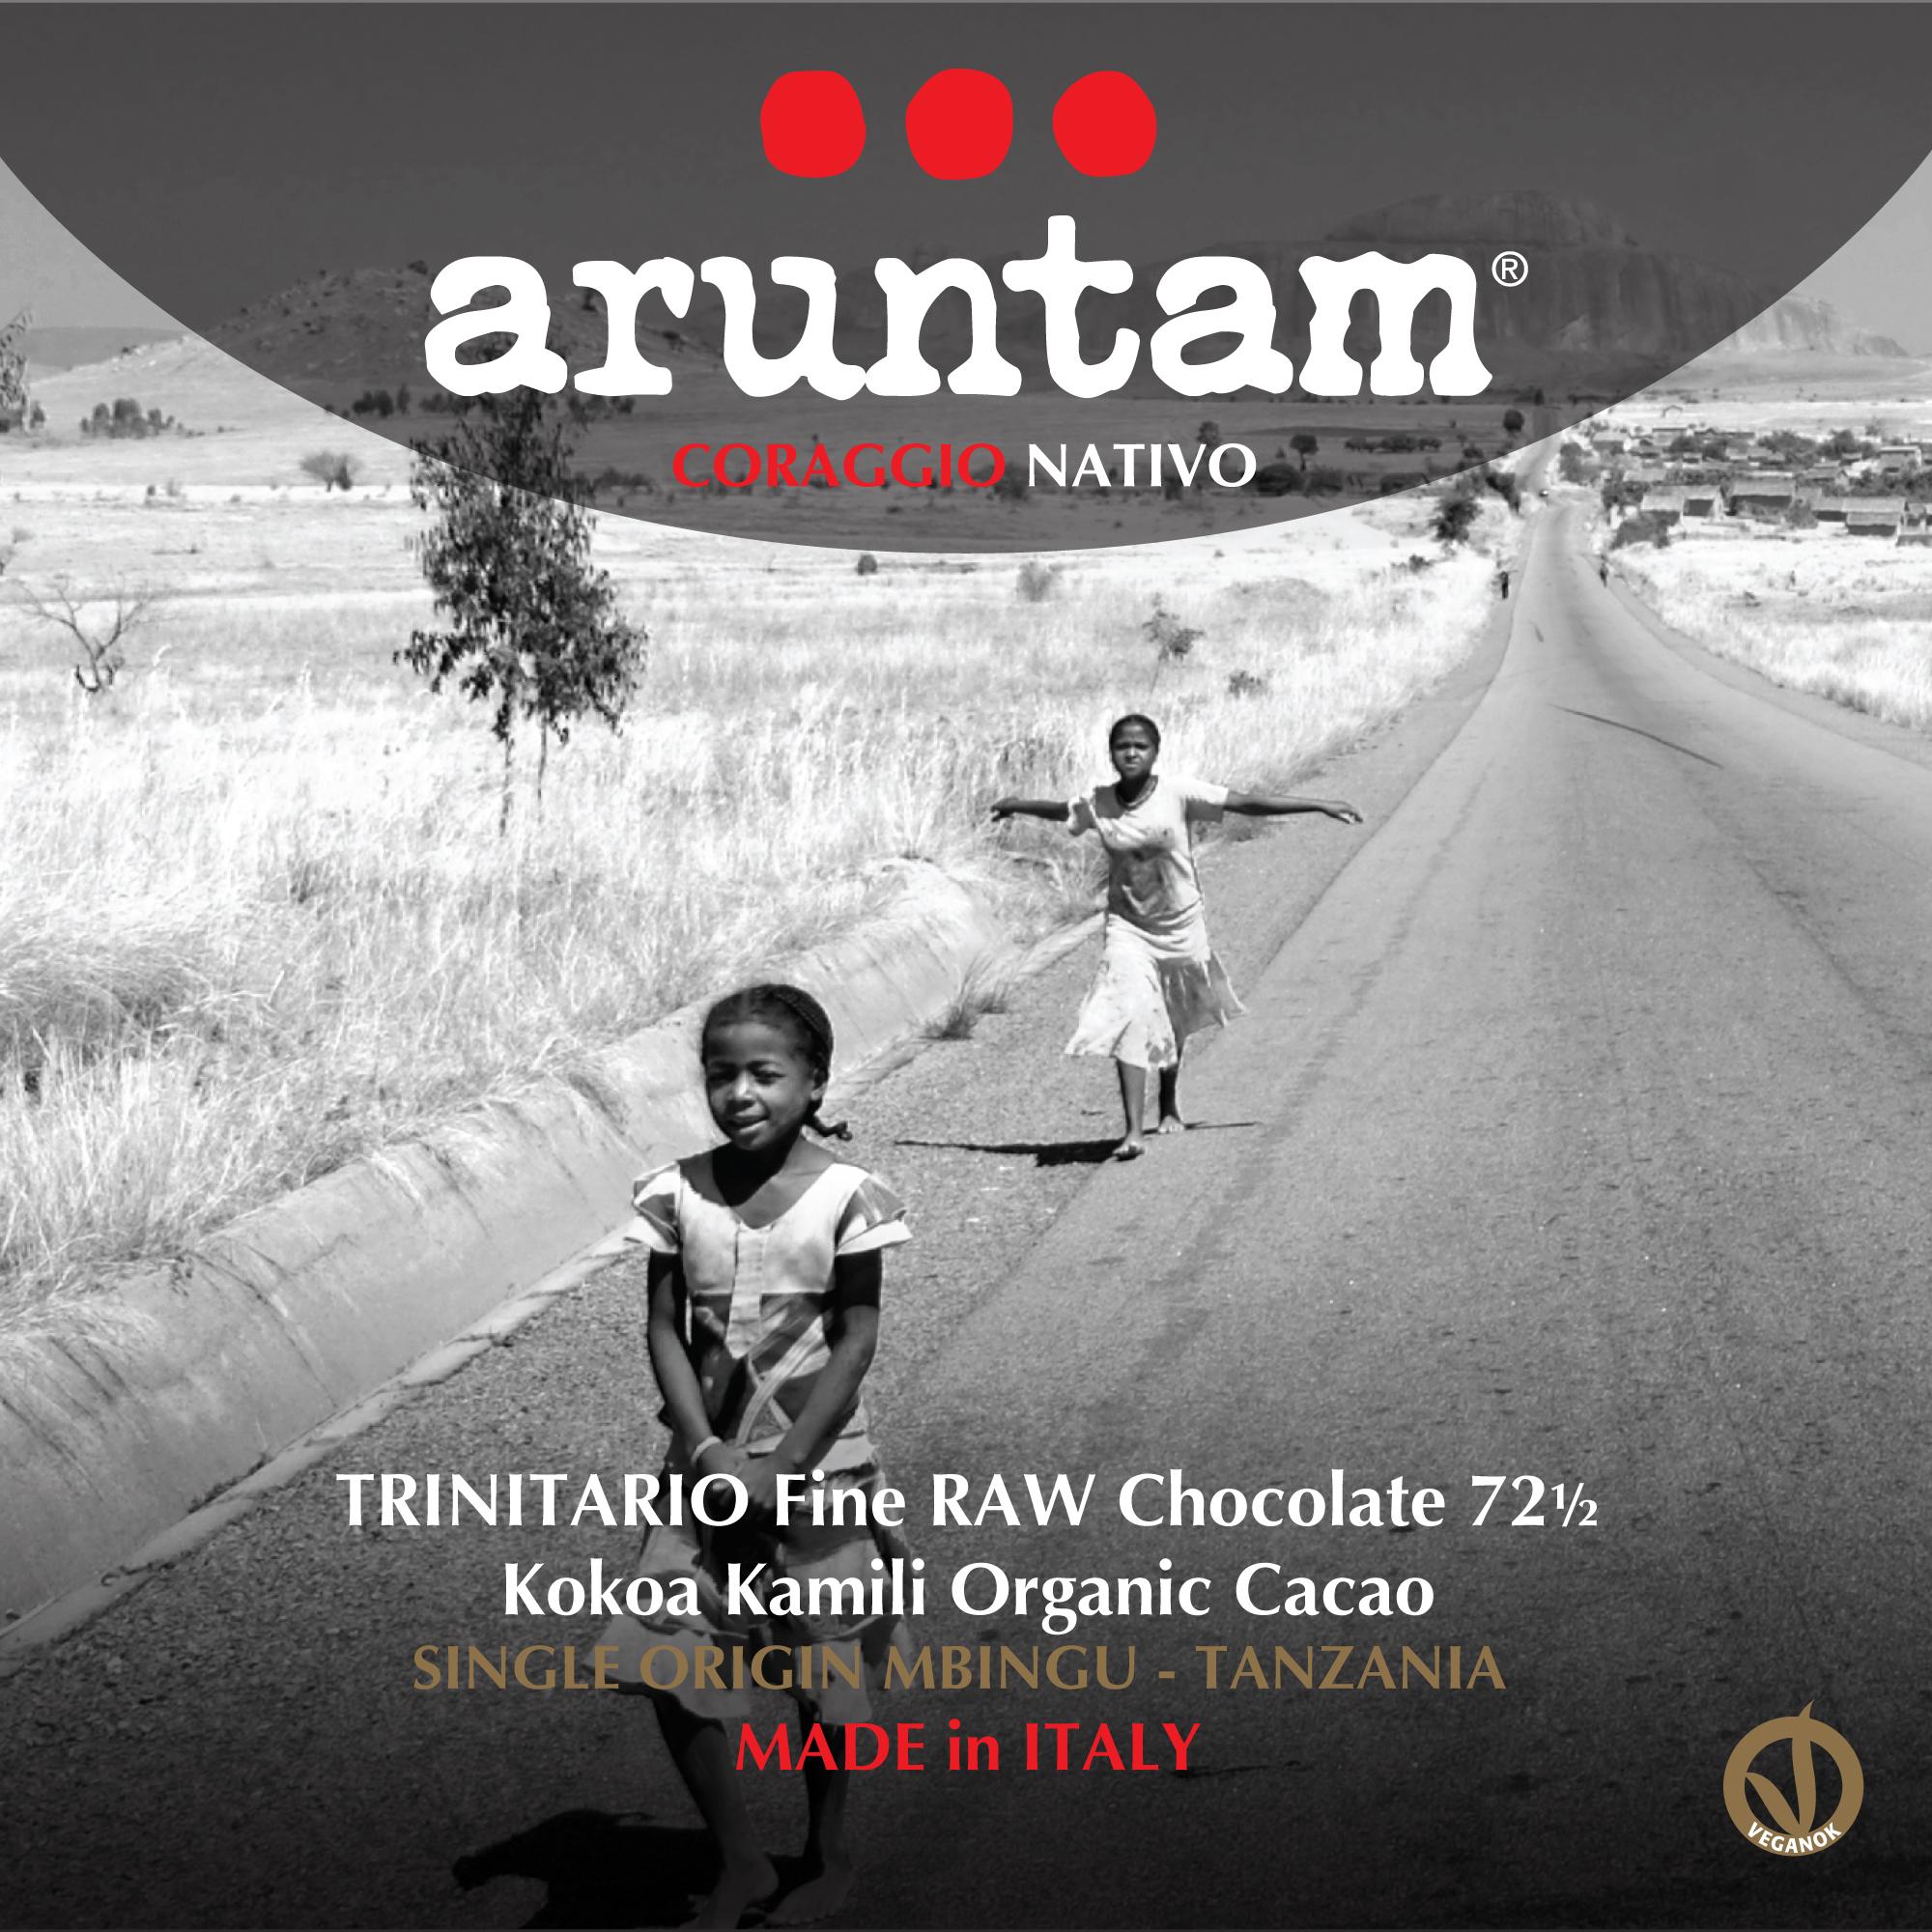 12-Trinitario-Fine-Raw-Chocolate-72-TANZANIA-AFRICA